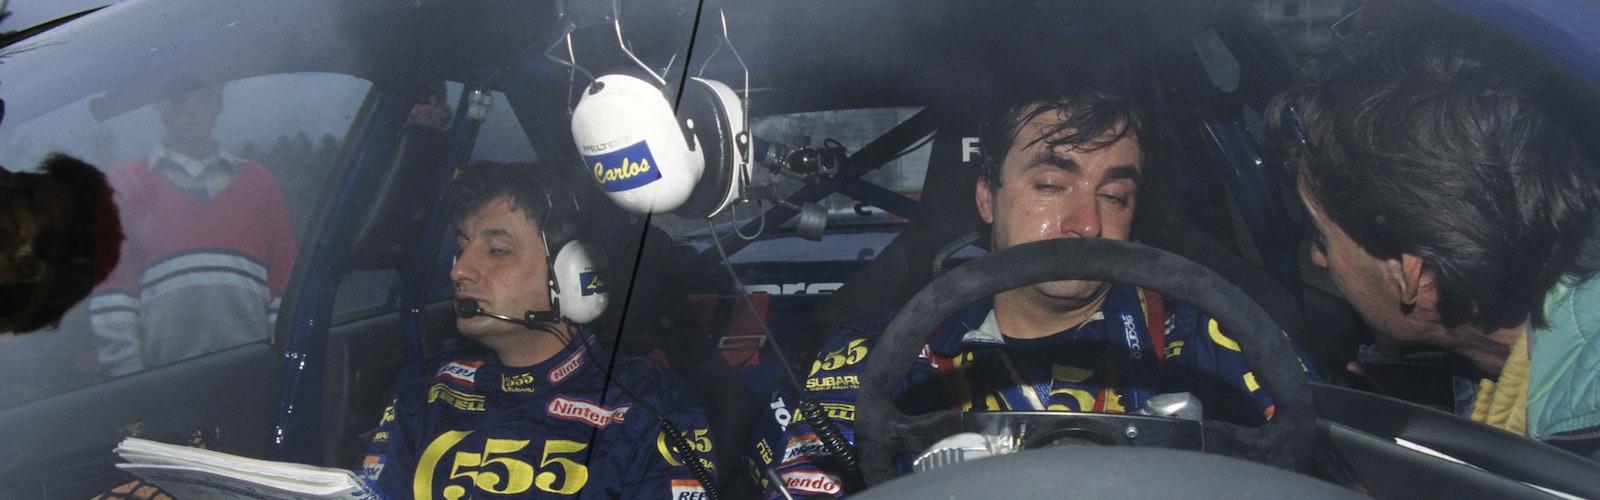 52256 1995, Portugal Rally, Moya, Luis, Sainz, Carlos, Subaru Impreza 555, Portrait